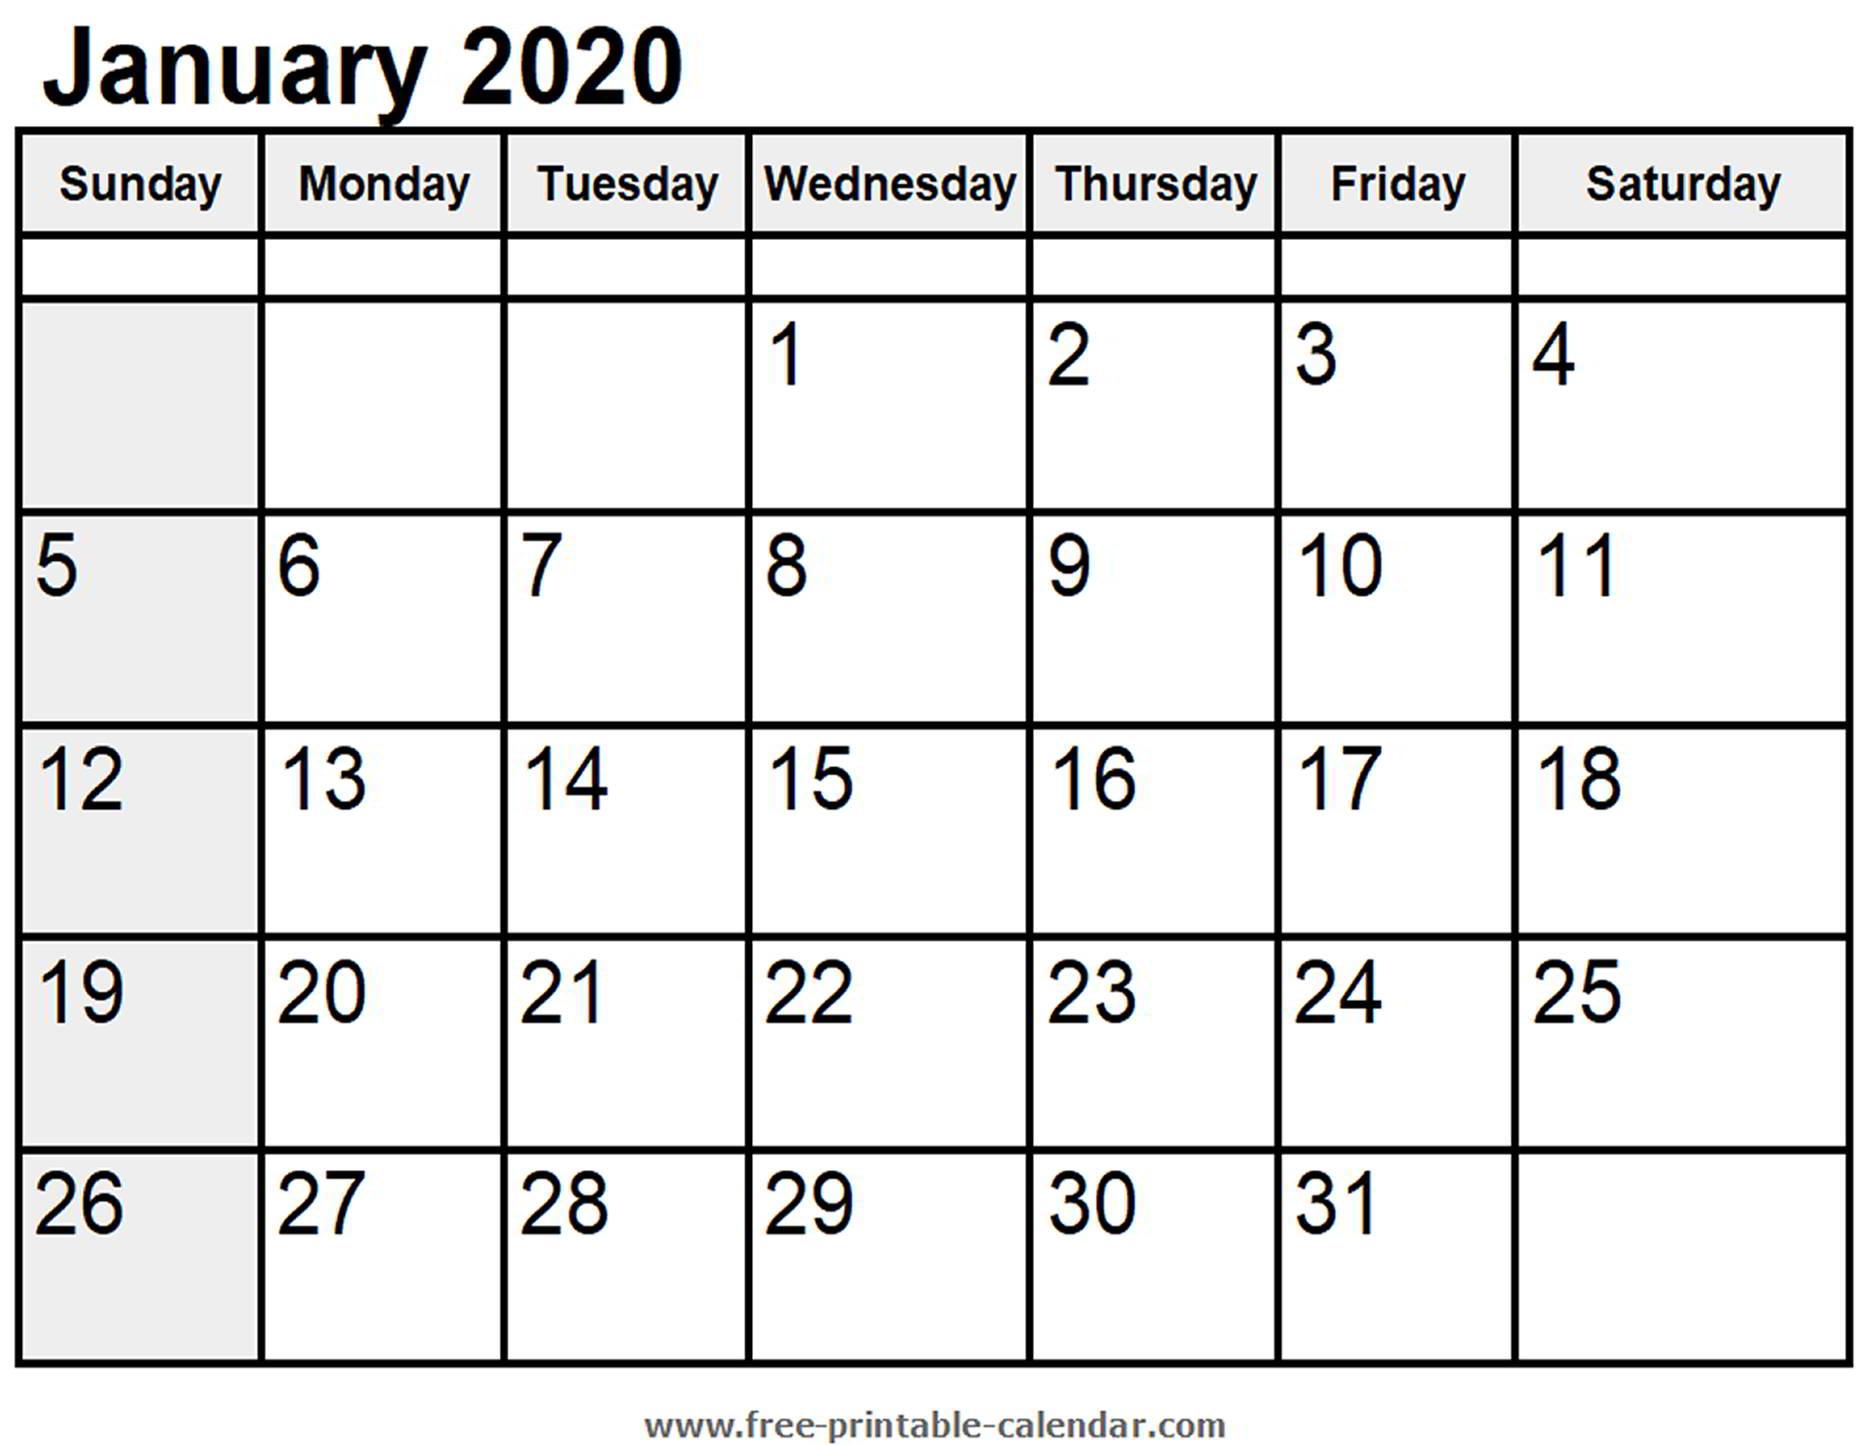 Calendar January 2020 - Free-Printable-Calendar